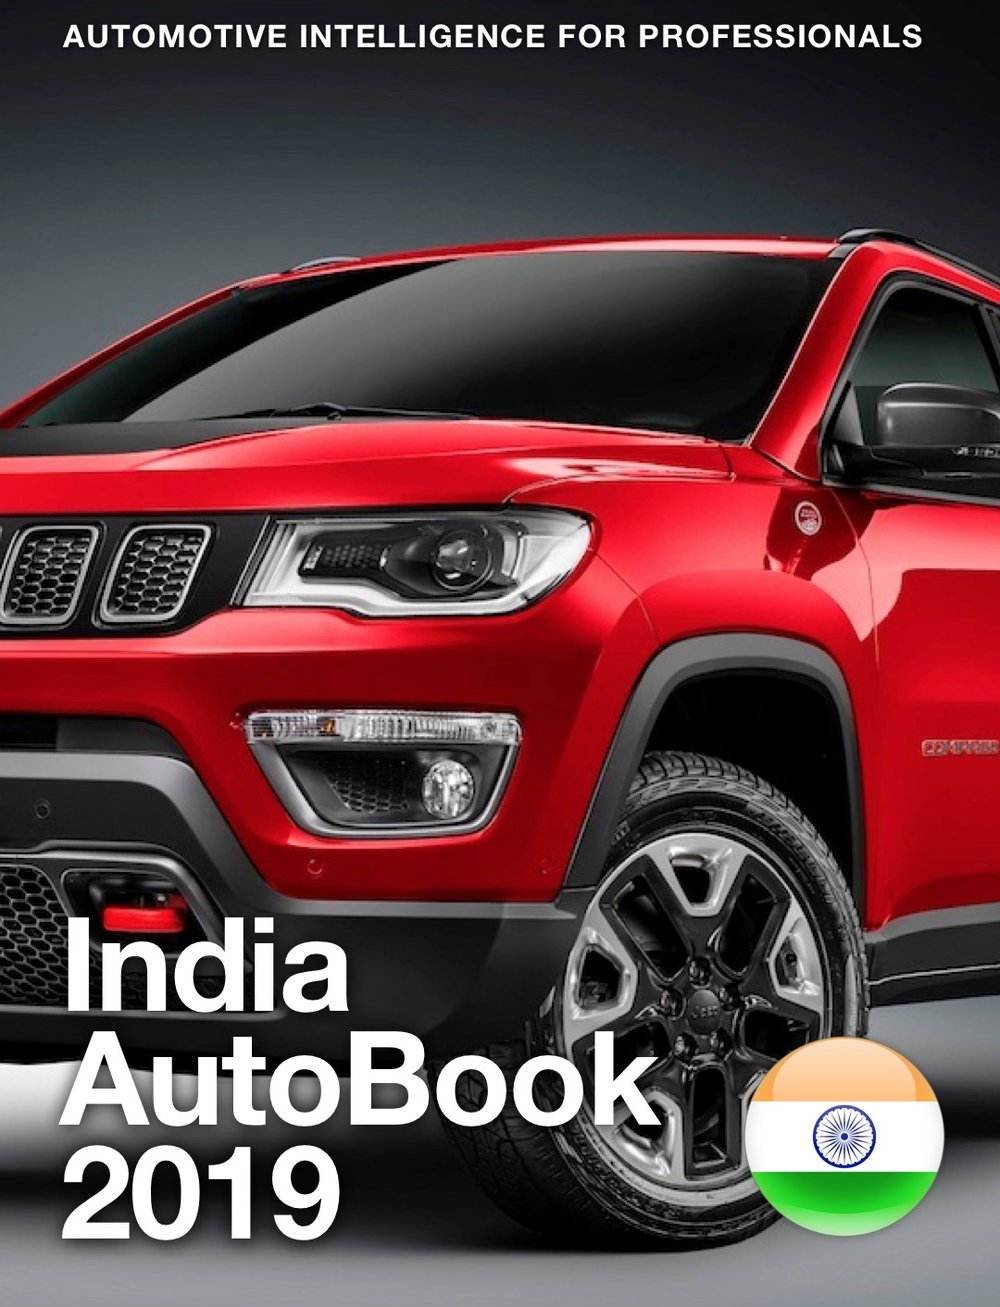 India AutoBook 2018 1026x1341.jpg